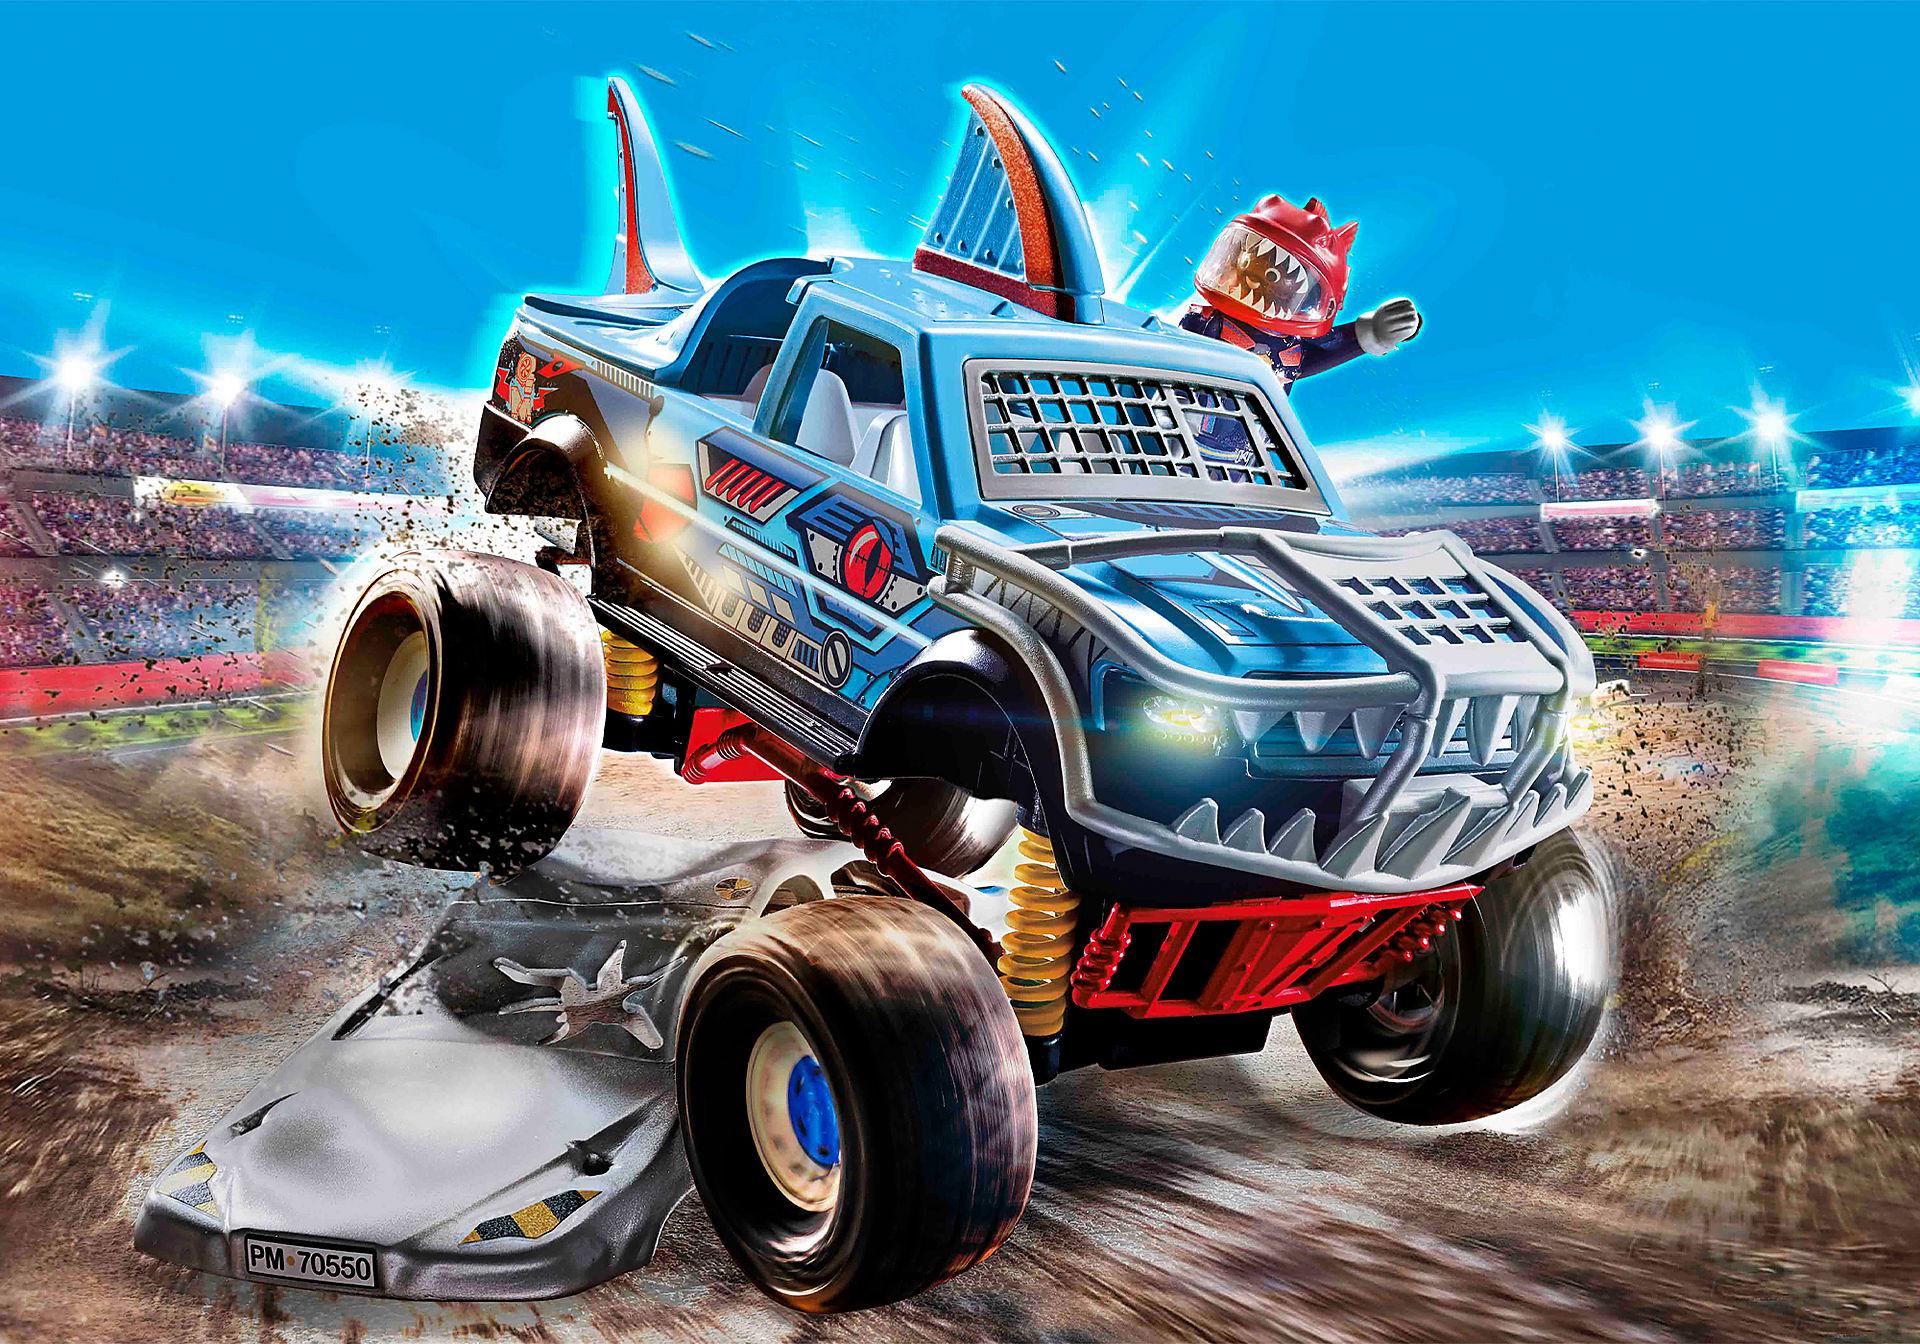 70550 Stuntshow Monster Truck Hval zoom image1